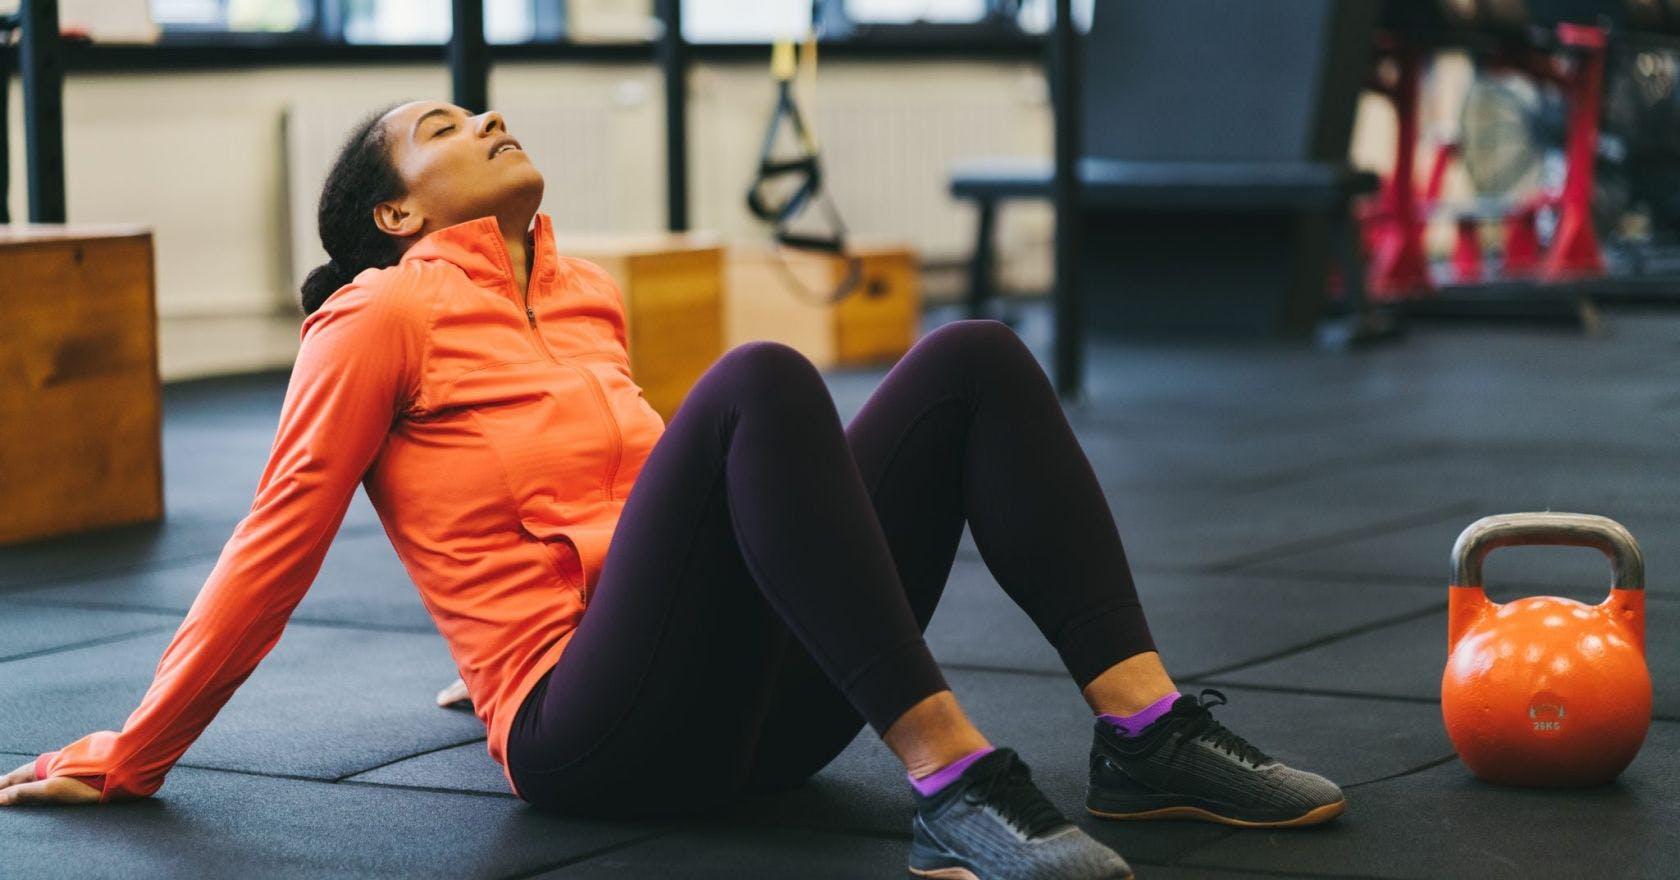 Training-induced amenorrhea